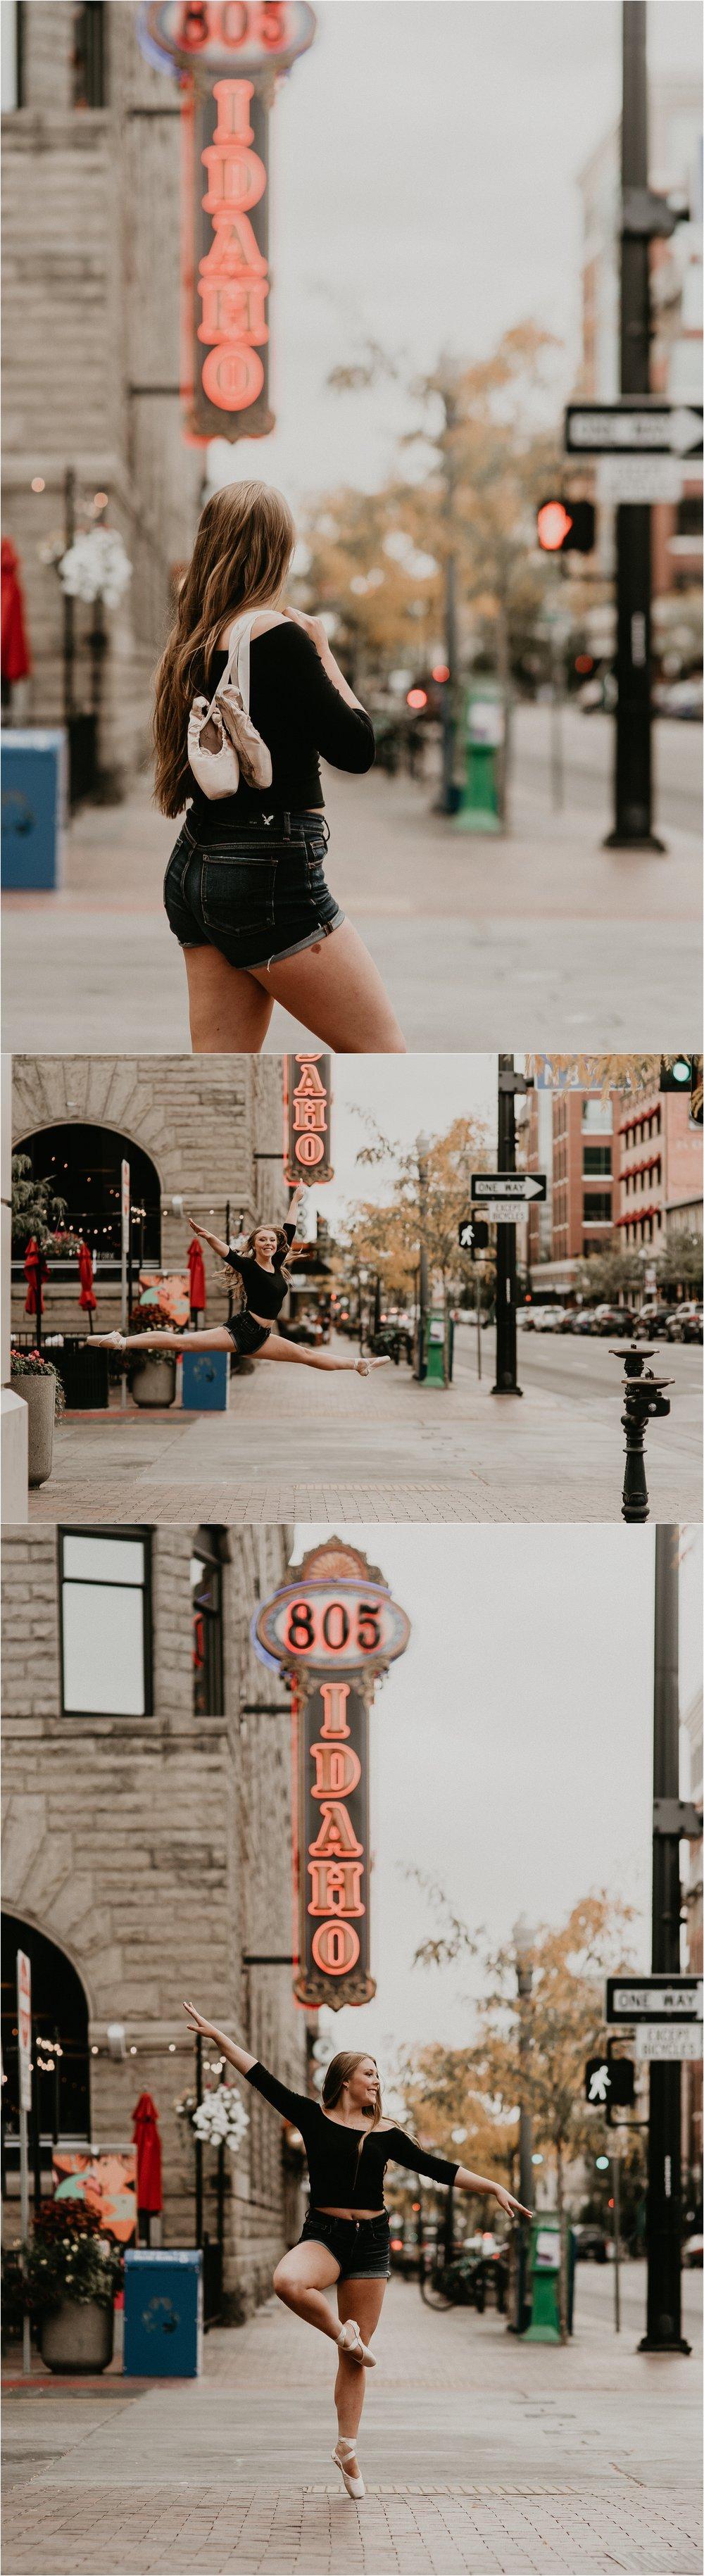 Boise Senior Photographer Makayla Madden Photography Senior Girl Capital High School Kailee Roberts Urban Dancing Senior Pictures Ballet Point Dance Senior Photos  Downtown Boise Idaho St Sign